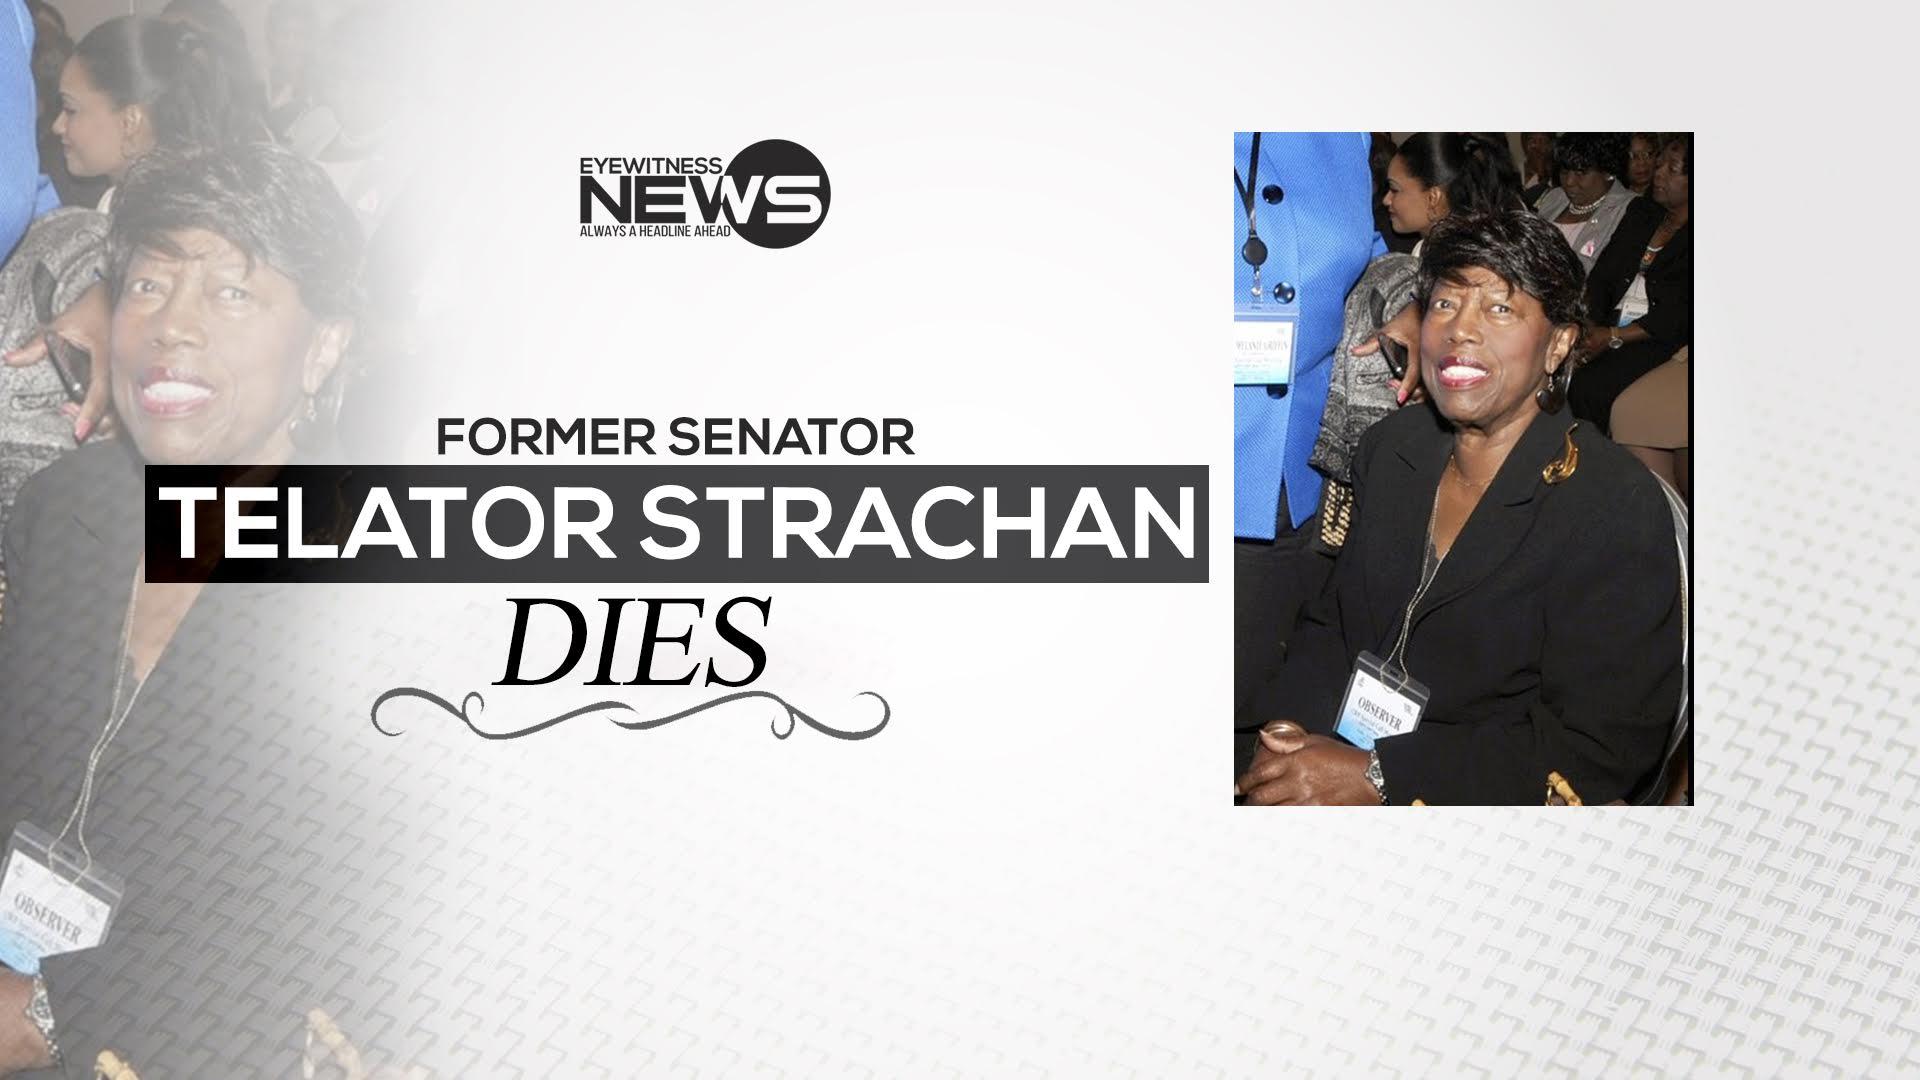 Former Senator dies